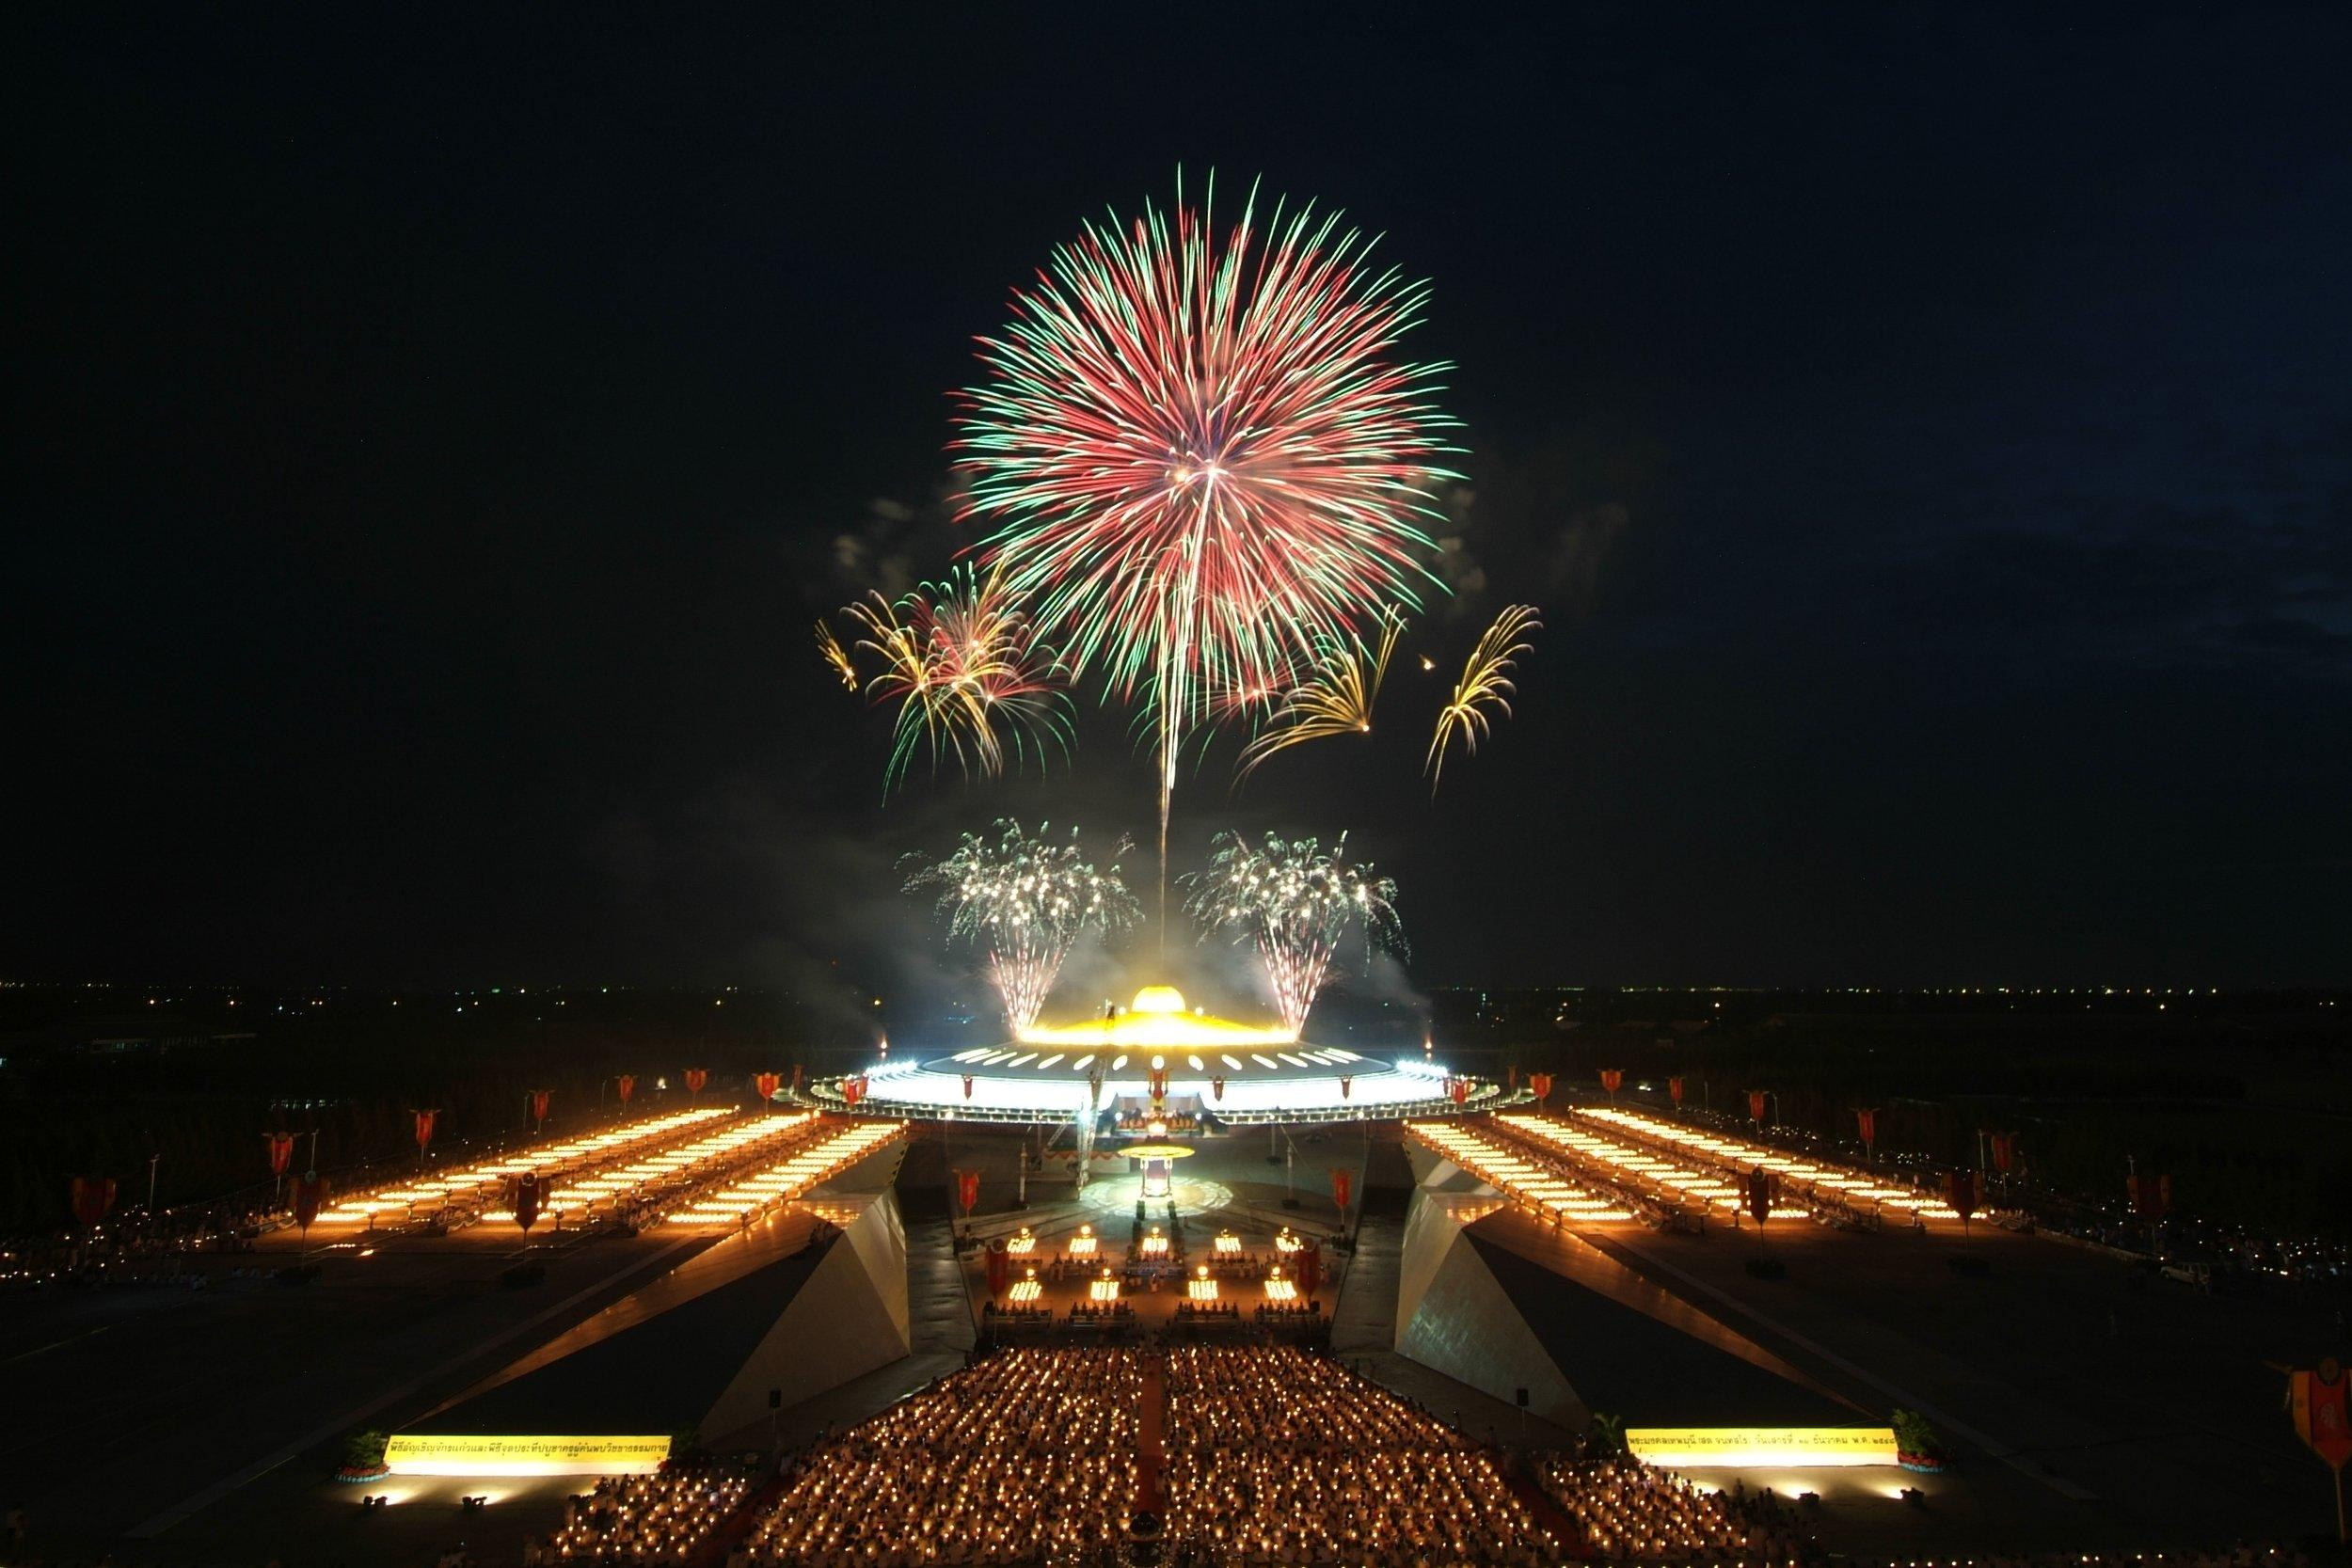 lights-night-firework-new-year-s-eve.jpg